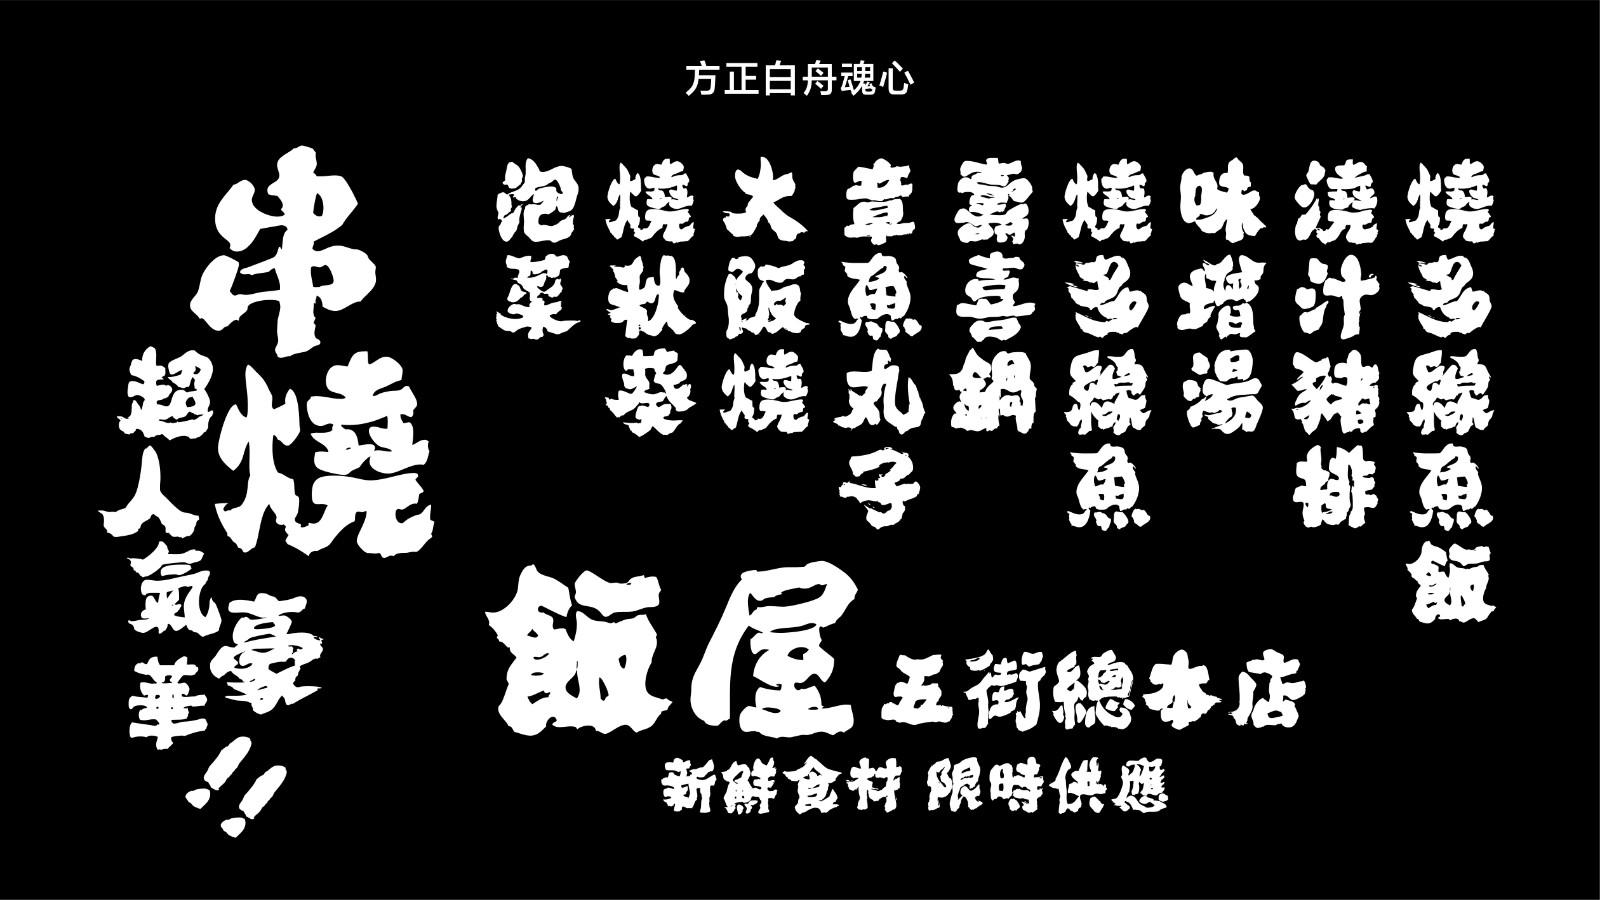 https://ft-bk1.oss-cn-zhangjiakou.aliyuncs.com/Public/Uploads/img/n_content_20201210180159_6643.jpg